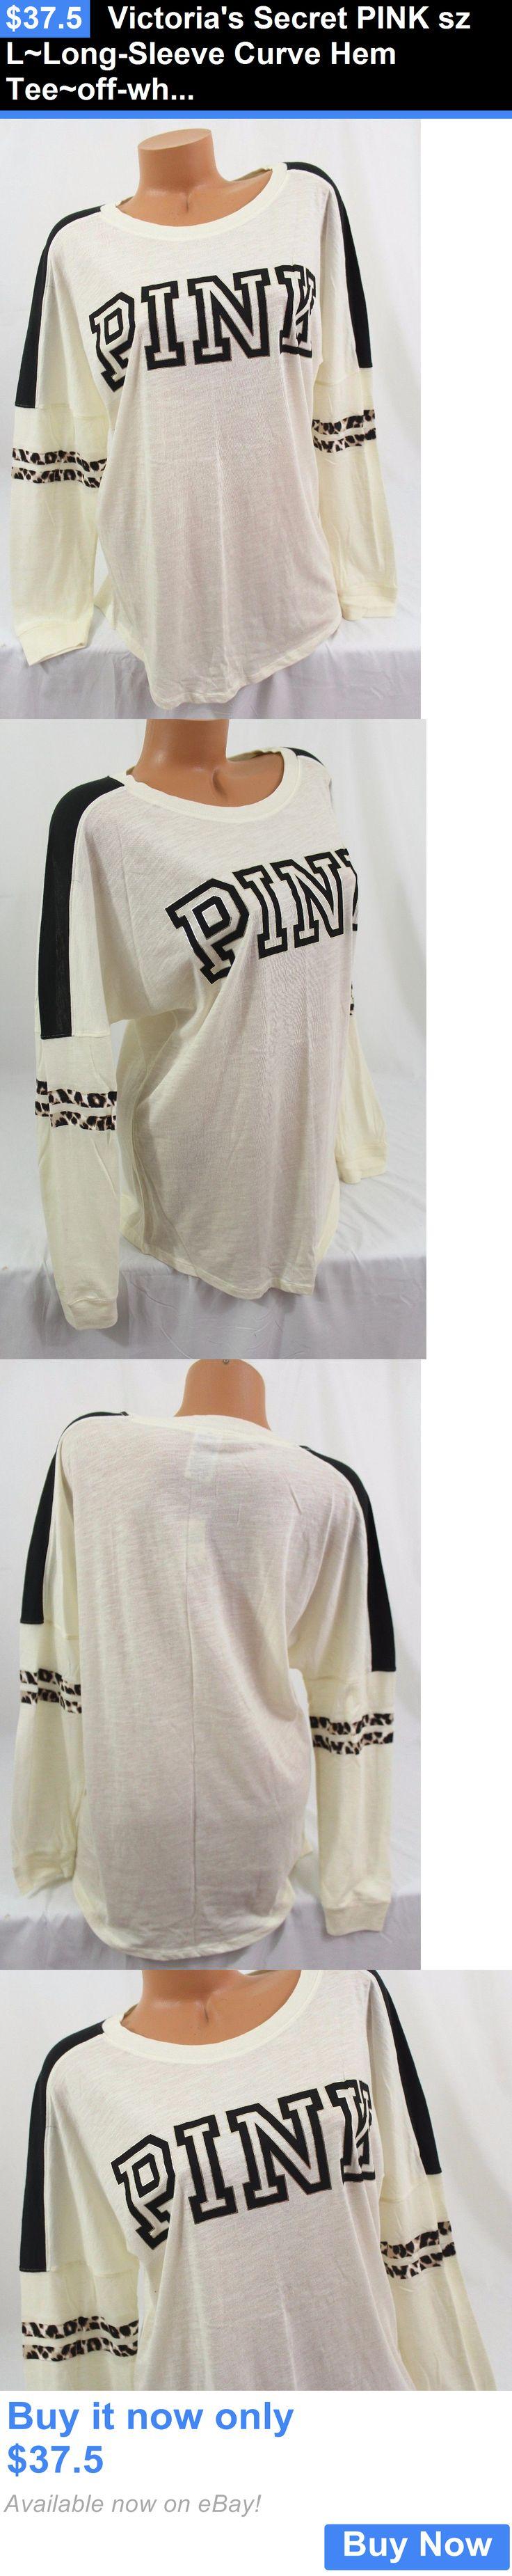 Women T Shirts: Victorias Secret Pink Sz L~Long-Sleeve Curve Hem Tee~Off-White/Black/Leopard BUY IT NOW ONLY: $37.5